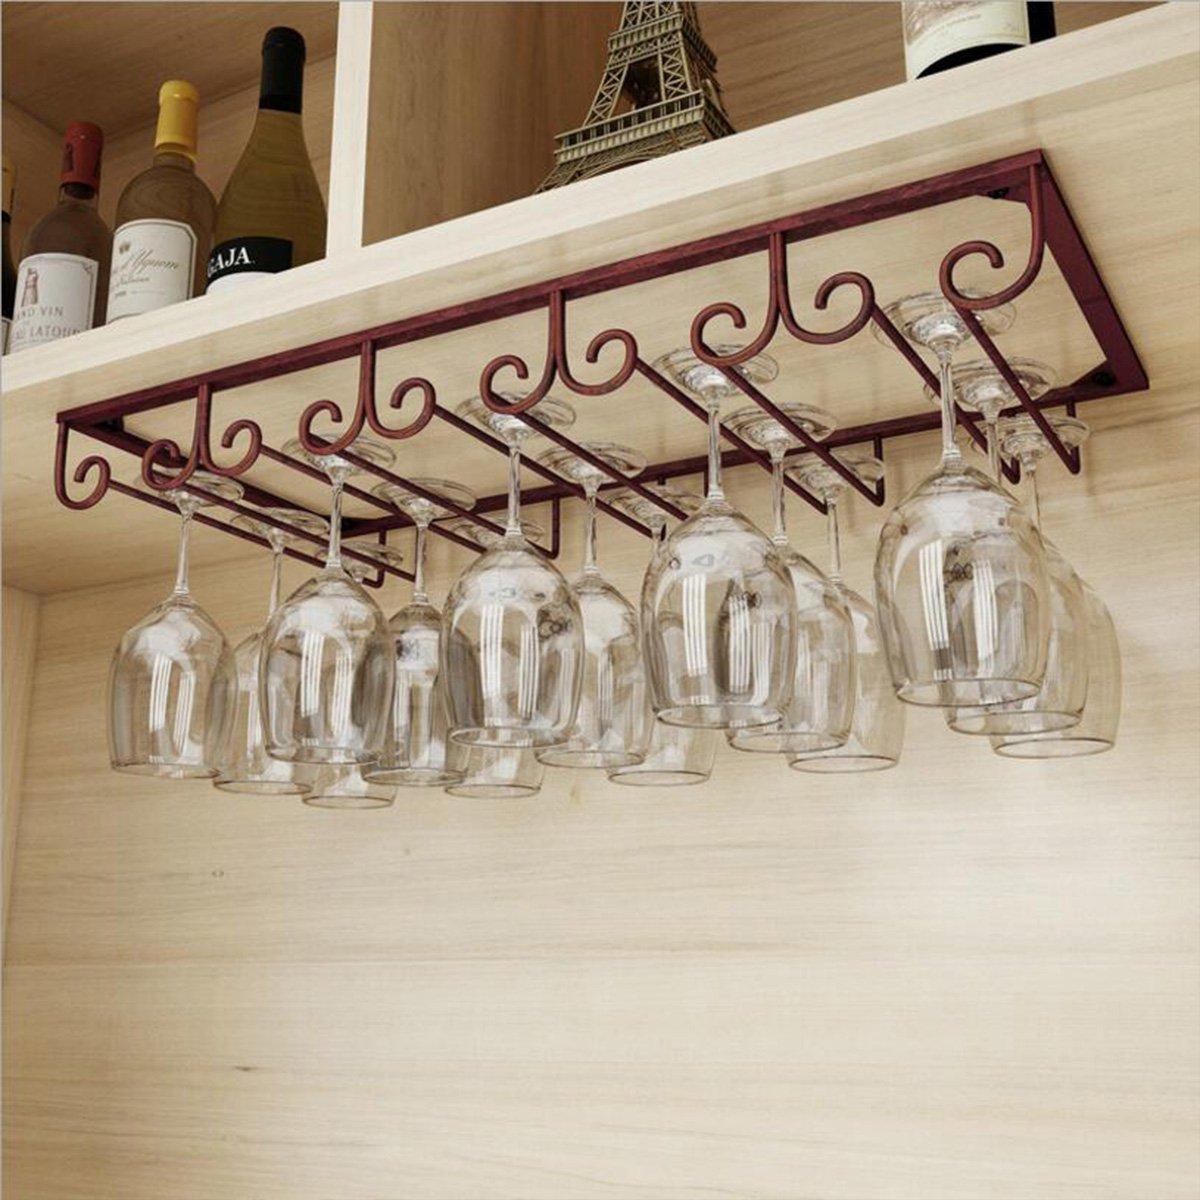 MZGH ISLAND Under Cabinet Hanging Shelves 5 Slots,Vintage Wine Glass Rack,Organizer Storage Cup,Goblet Drying Shelf,Stemware Holder for Home Bar,Holds up to 10-15 Glasses(Bronze)